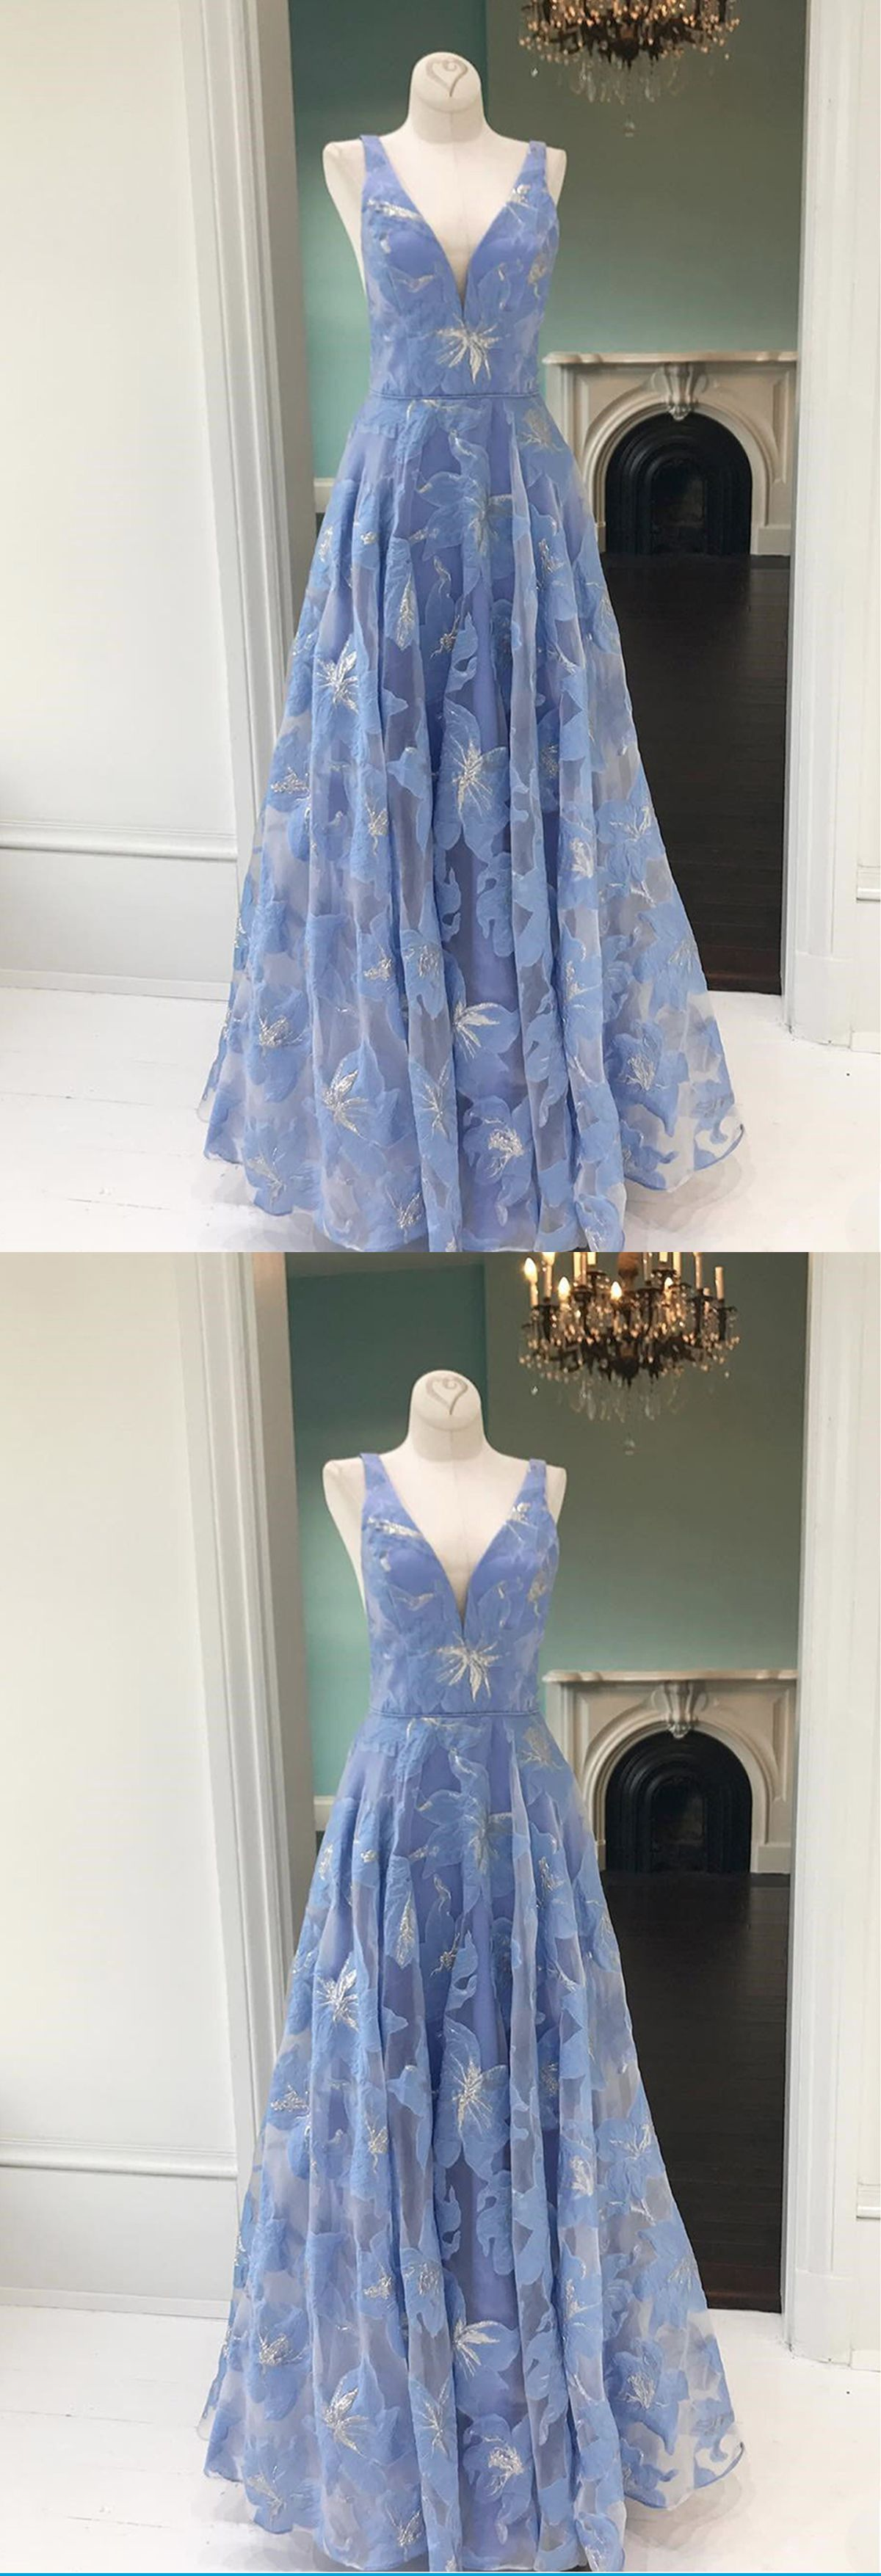 Simple blue floral lace v neck long halter customize prom dress